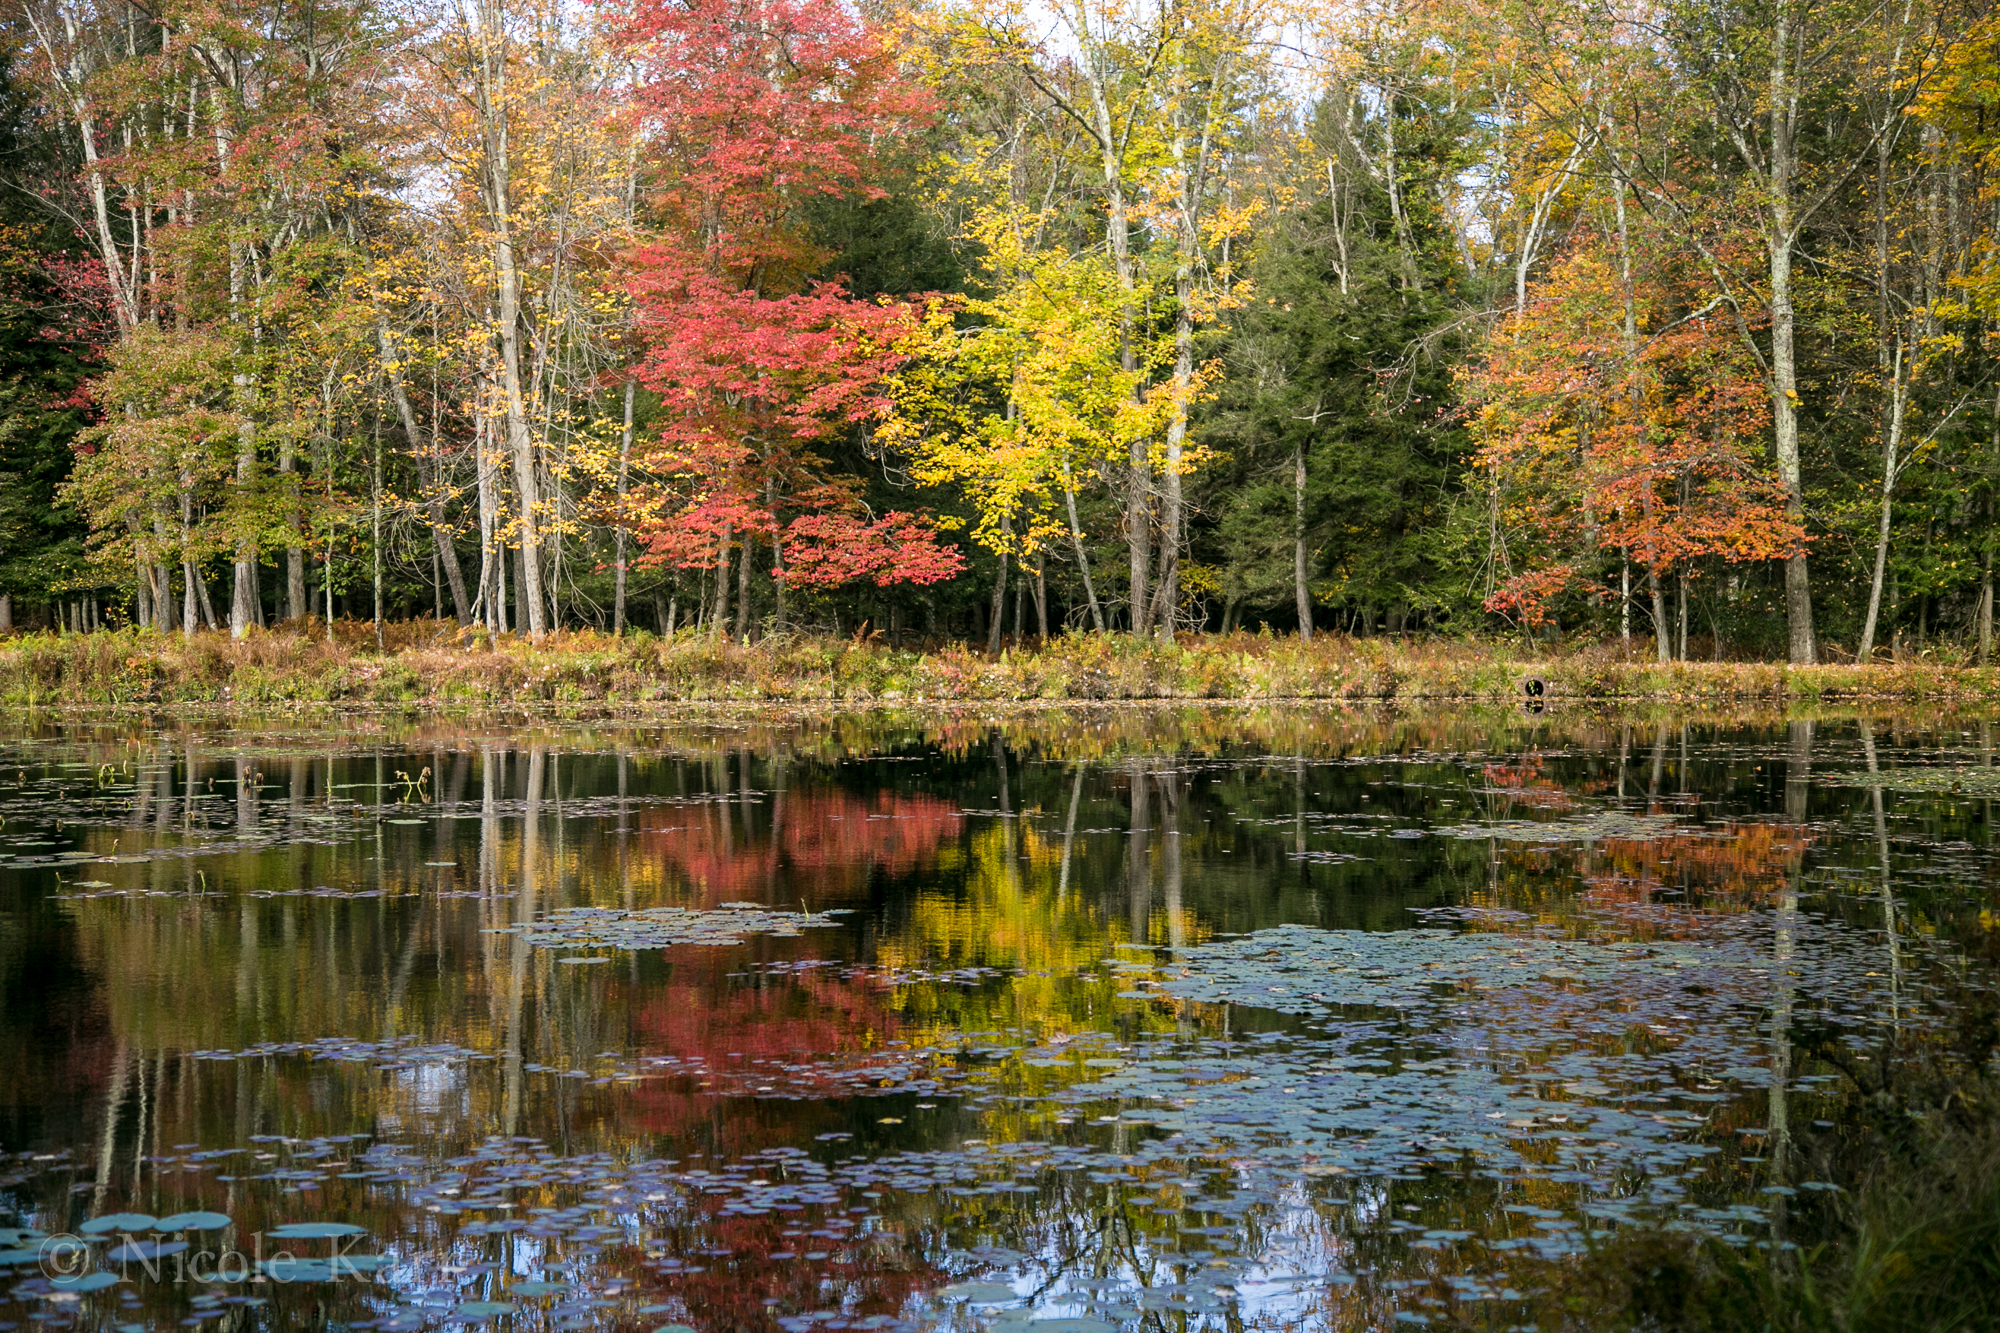 foliage refletced